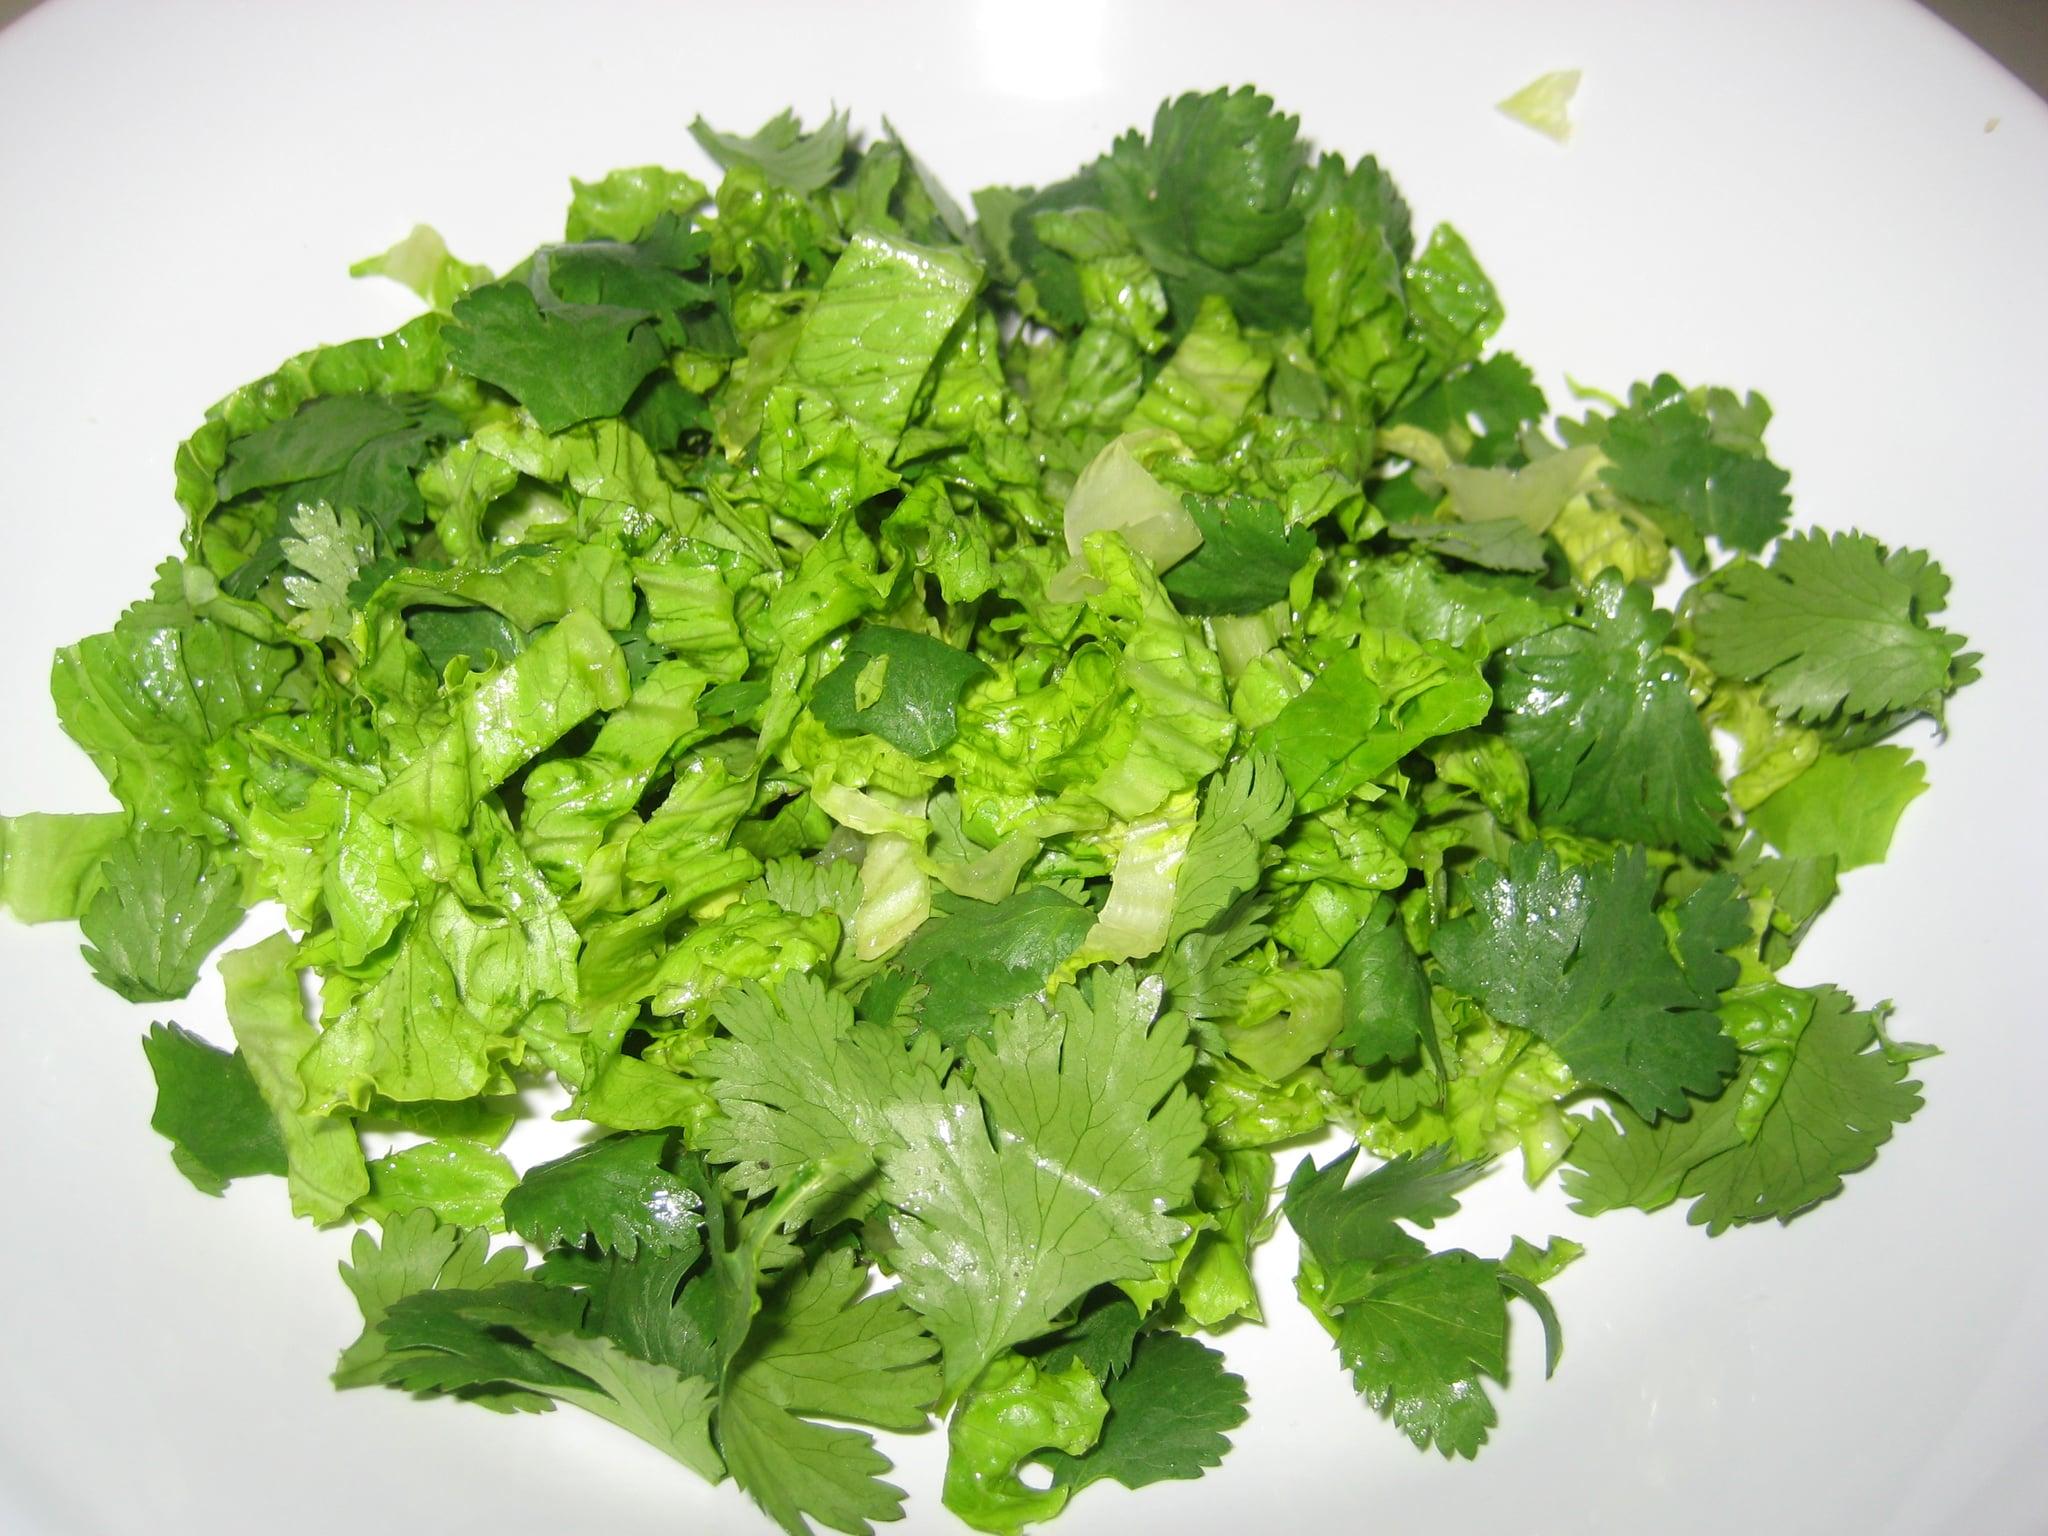 Tossed lettuce and cilantro.